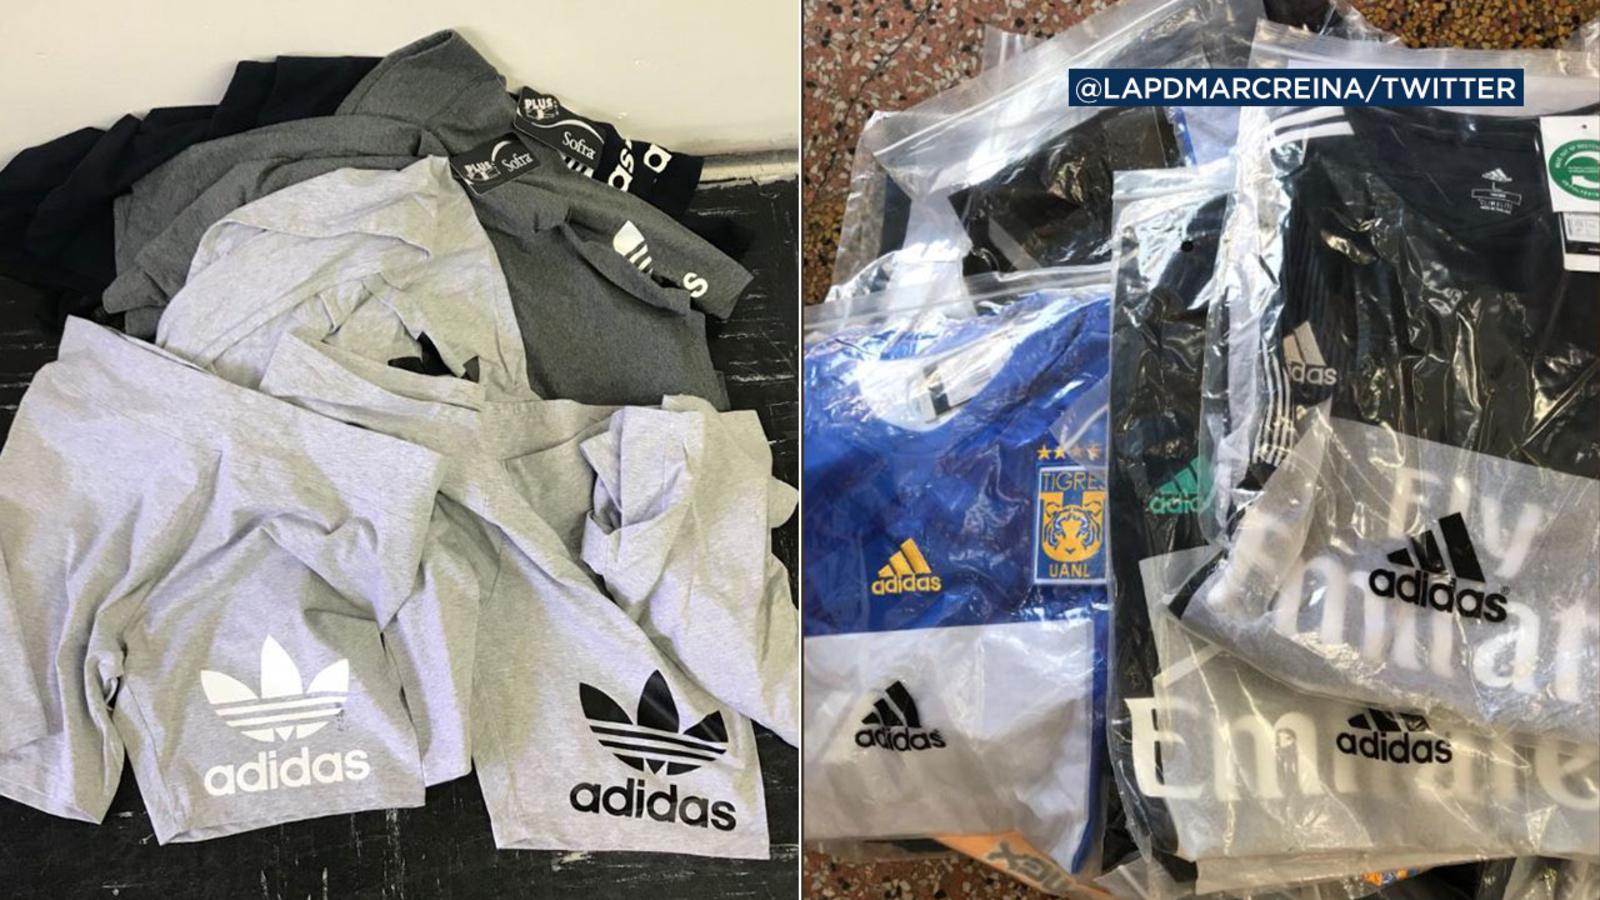 Limpiar el piso Céntrico Especial  LAPD seizes fake Adidas merchandise worth more than $200K in Santee Alley -  ABC7 Los Angeles